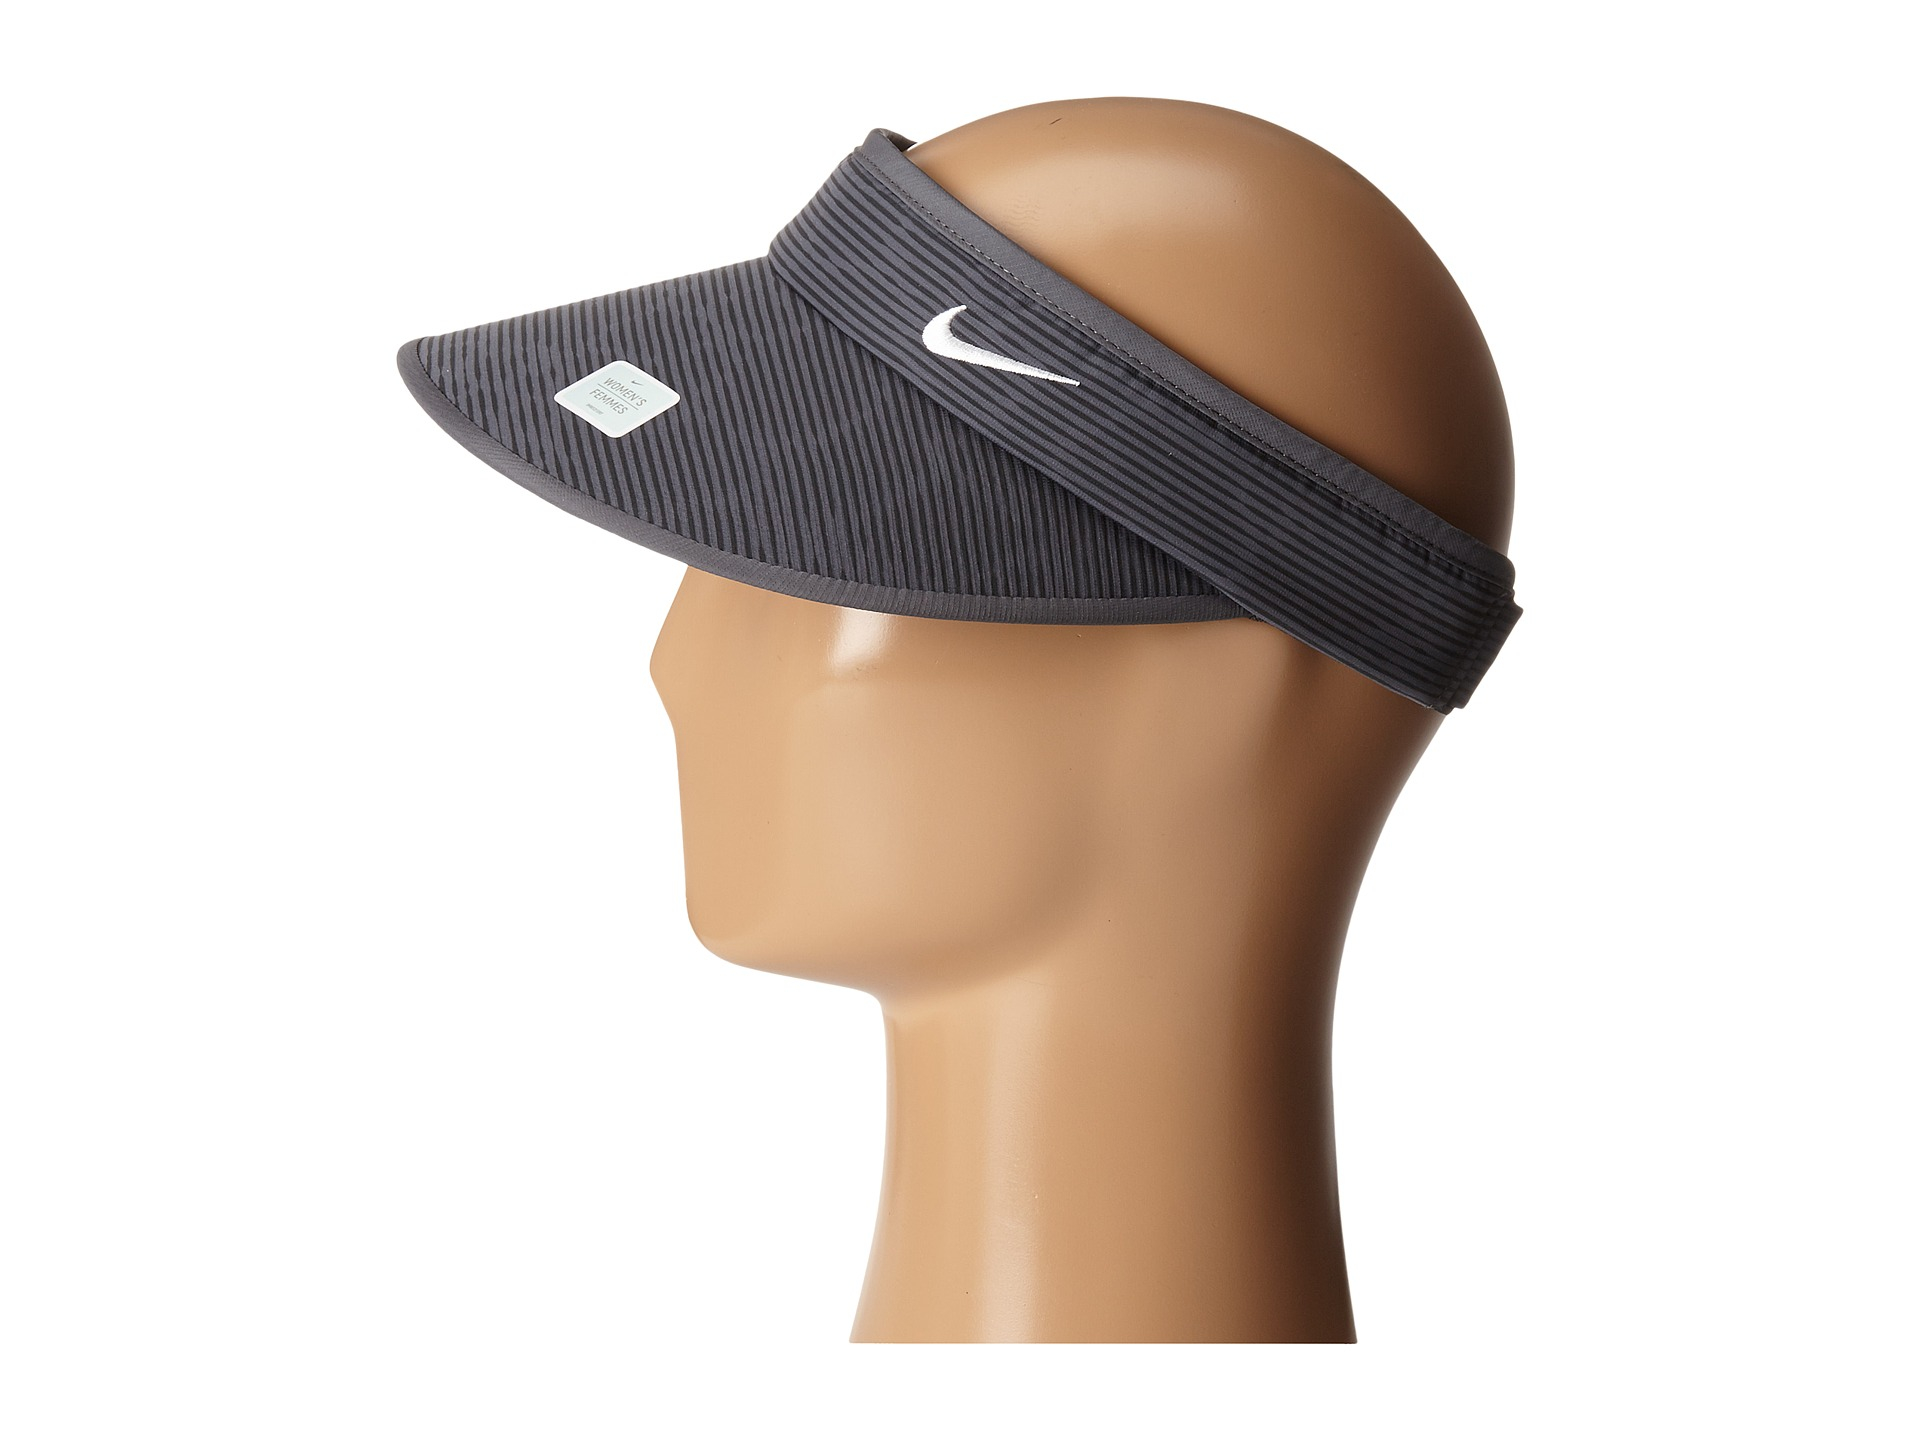 Lyst - Nike Big Bill Camoanimal Visor in Gray 0cb157c4e01